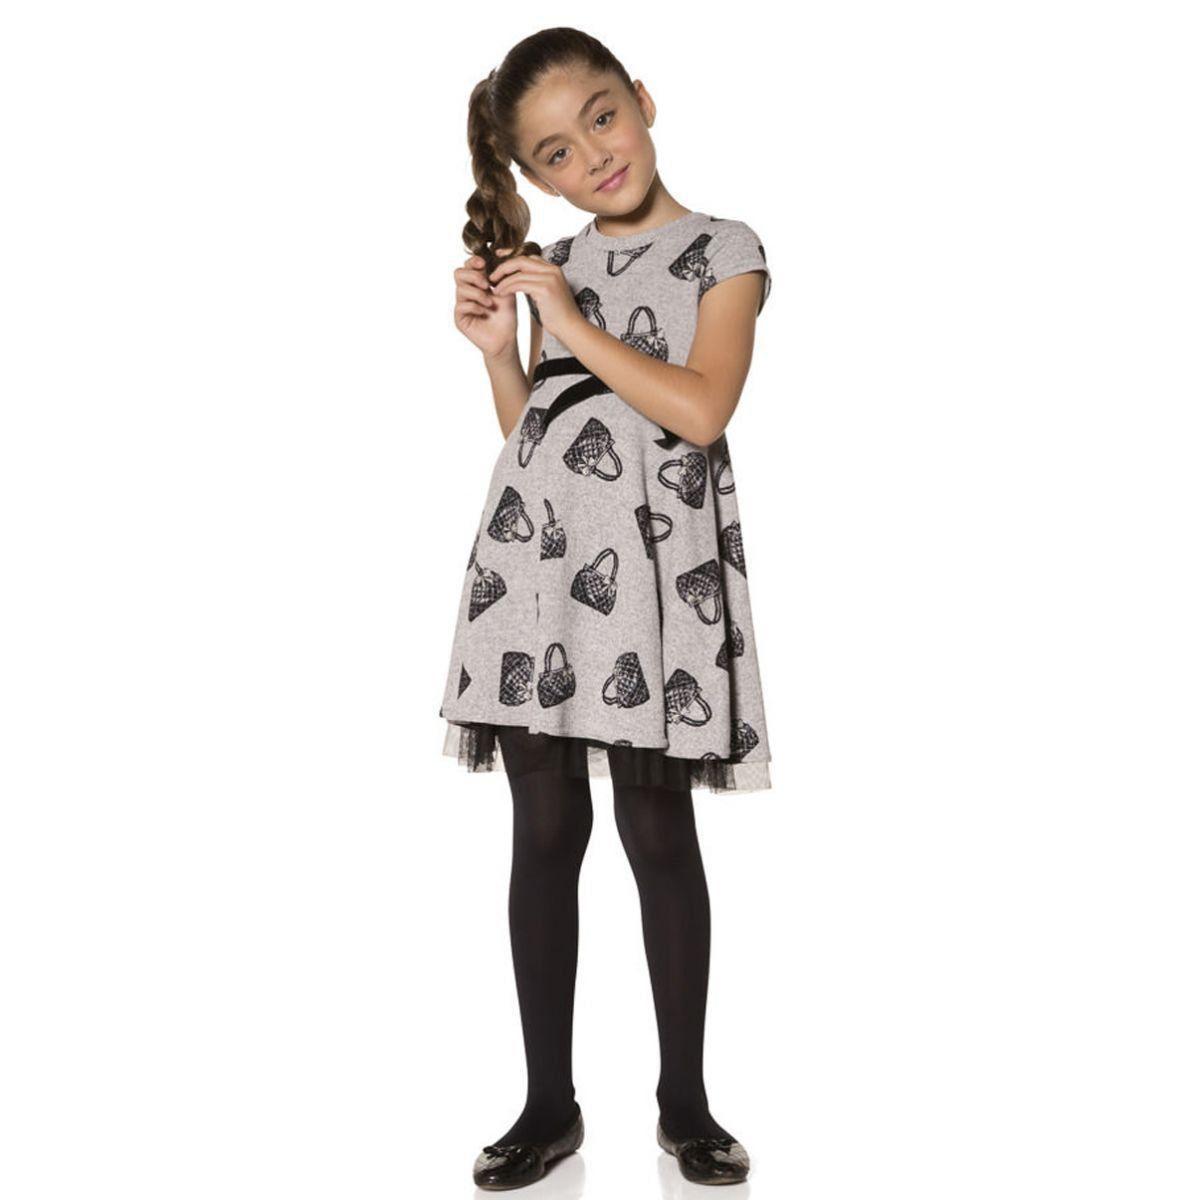 Meia calça infantil fio 40 menina Kit 3 Lobinha Lupo